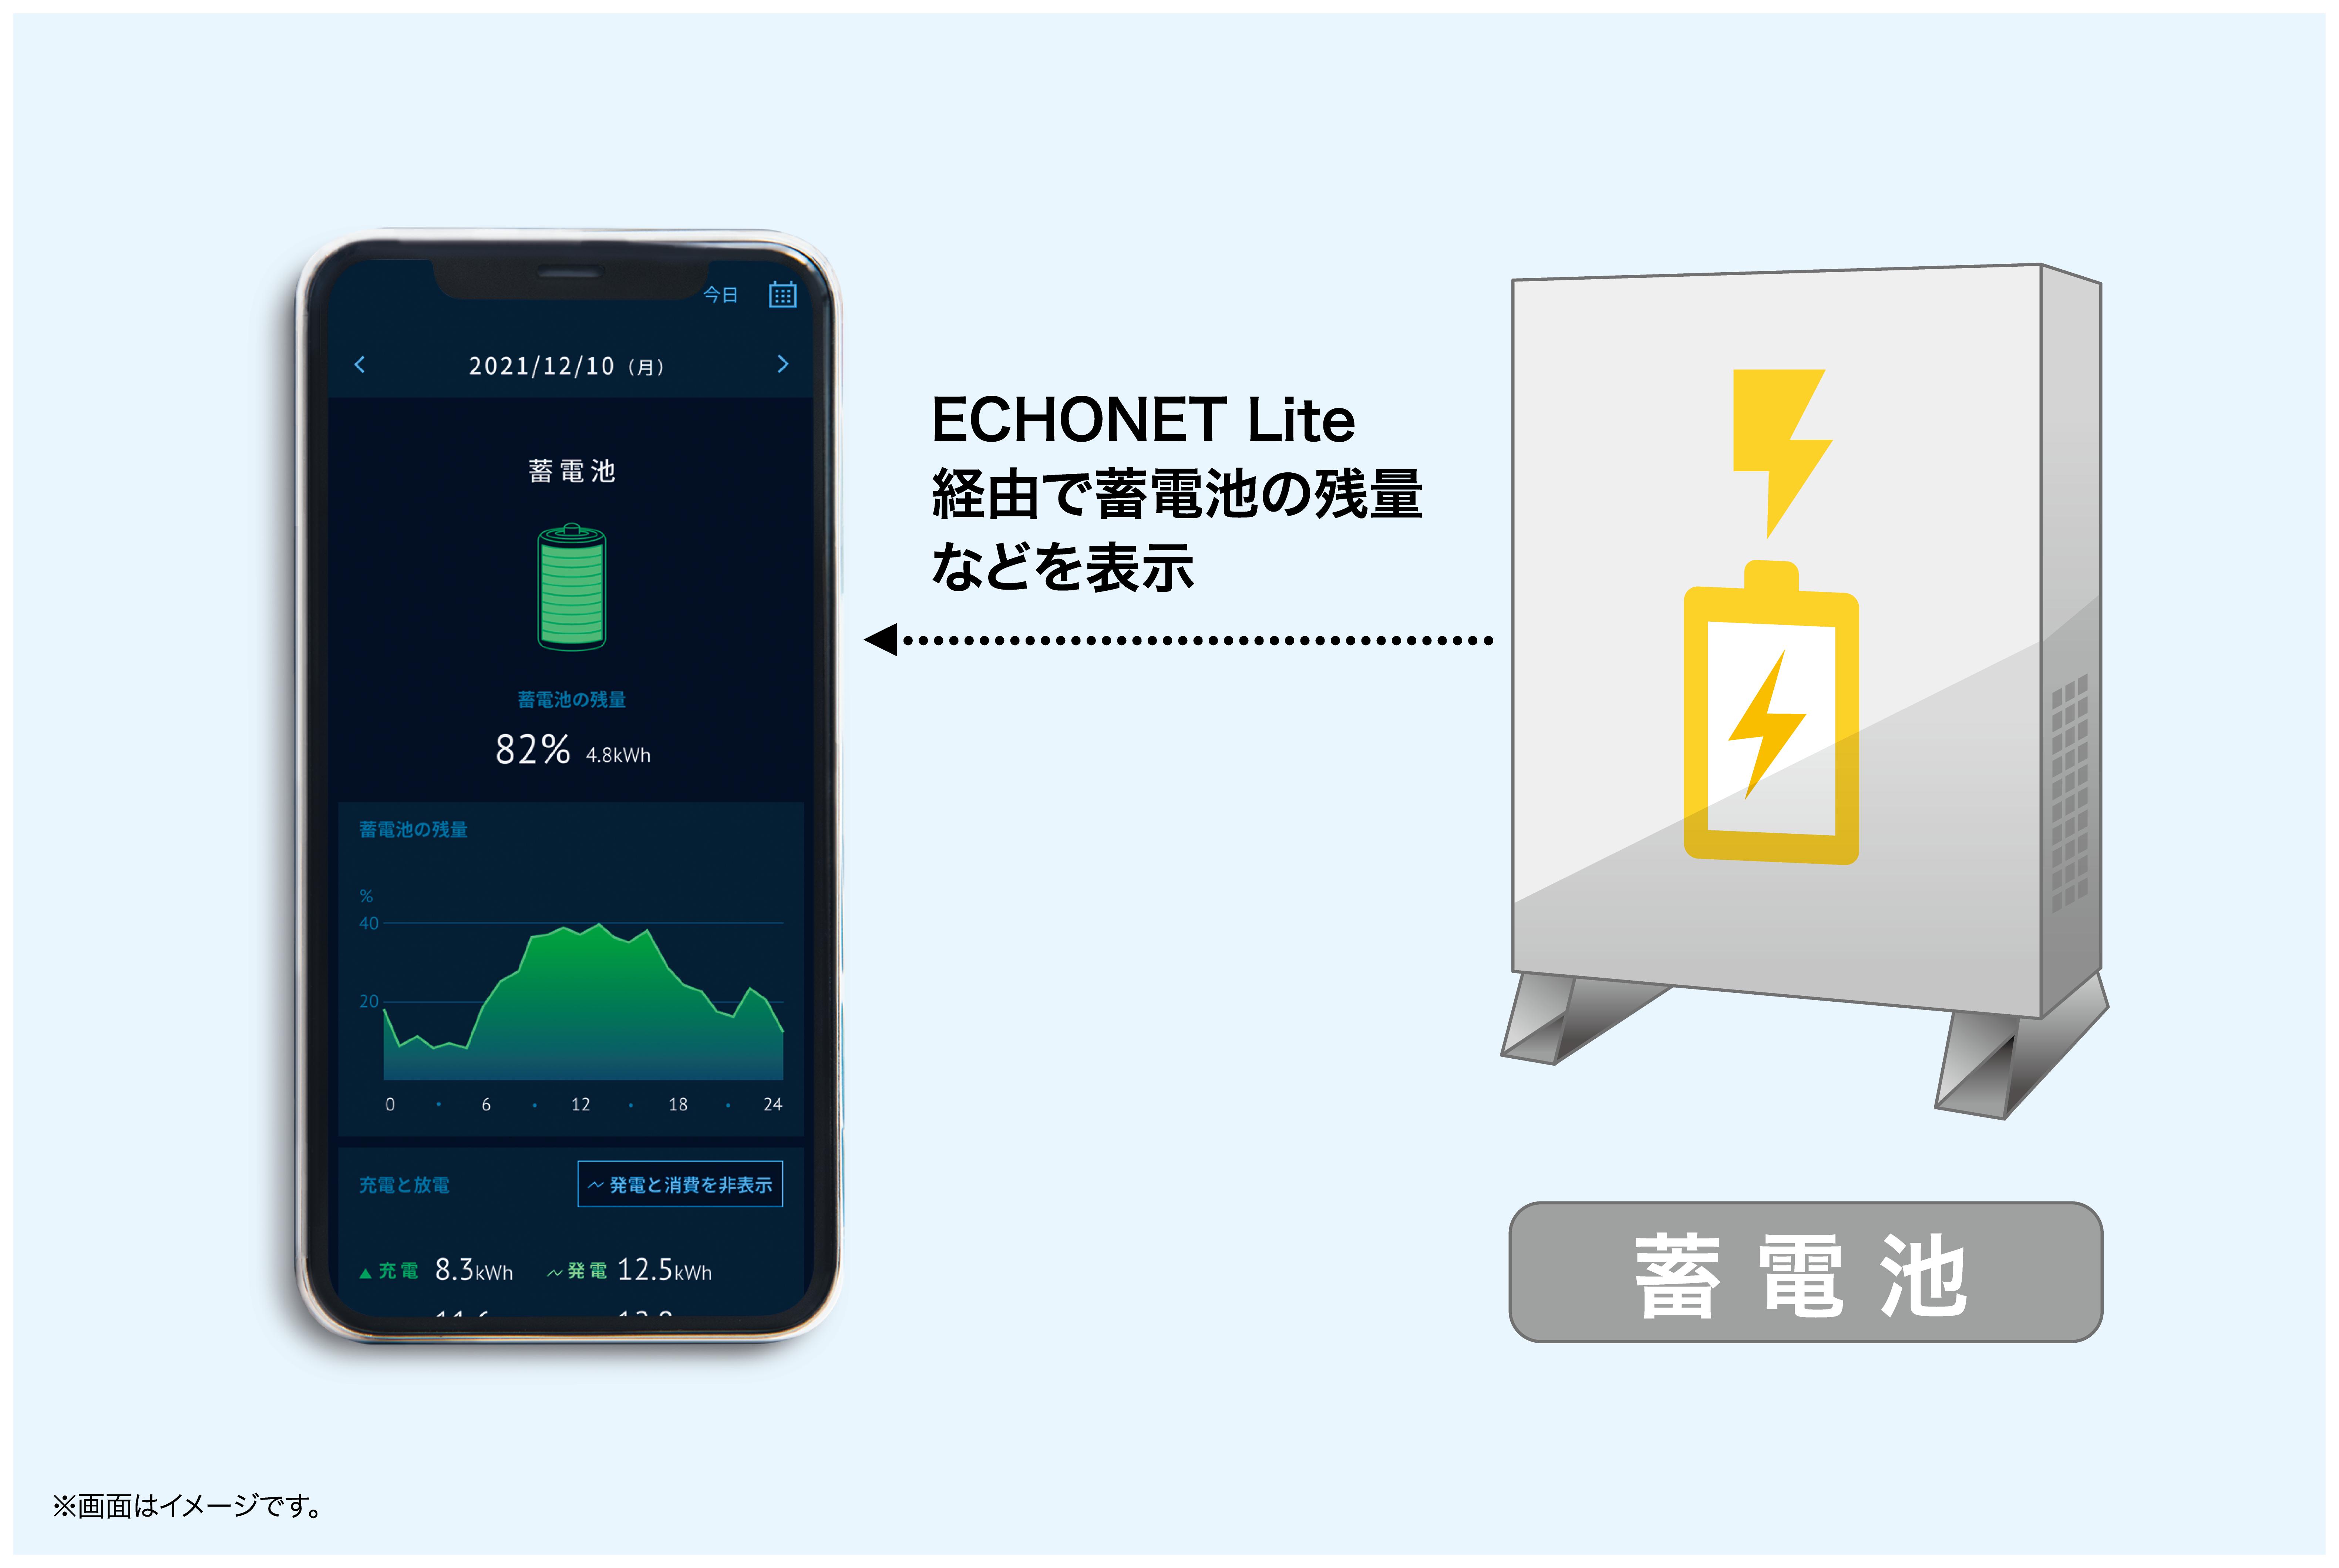 ⑤ECHONET Lite規格に対応.png